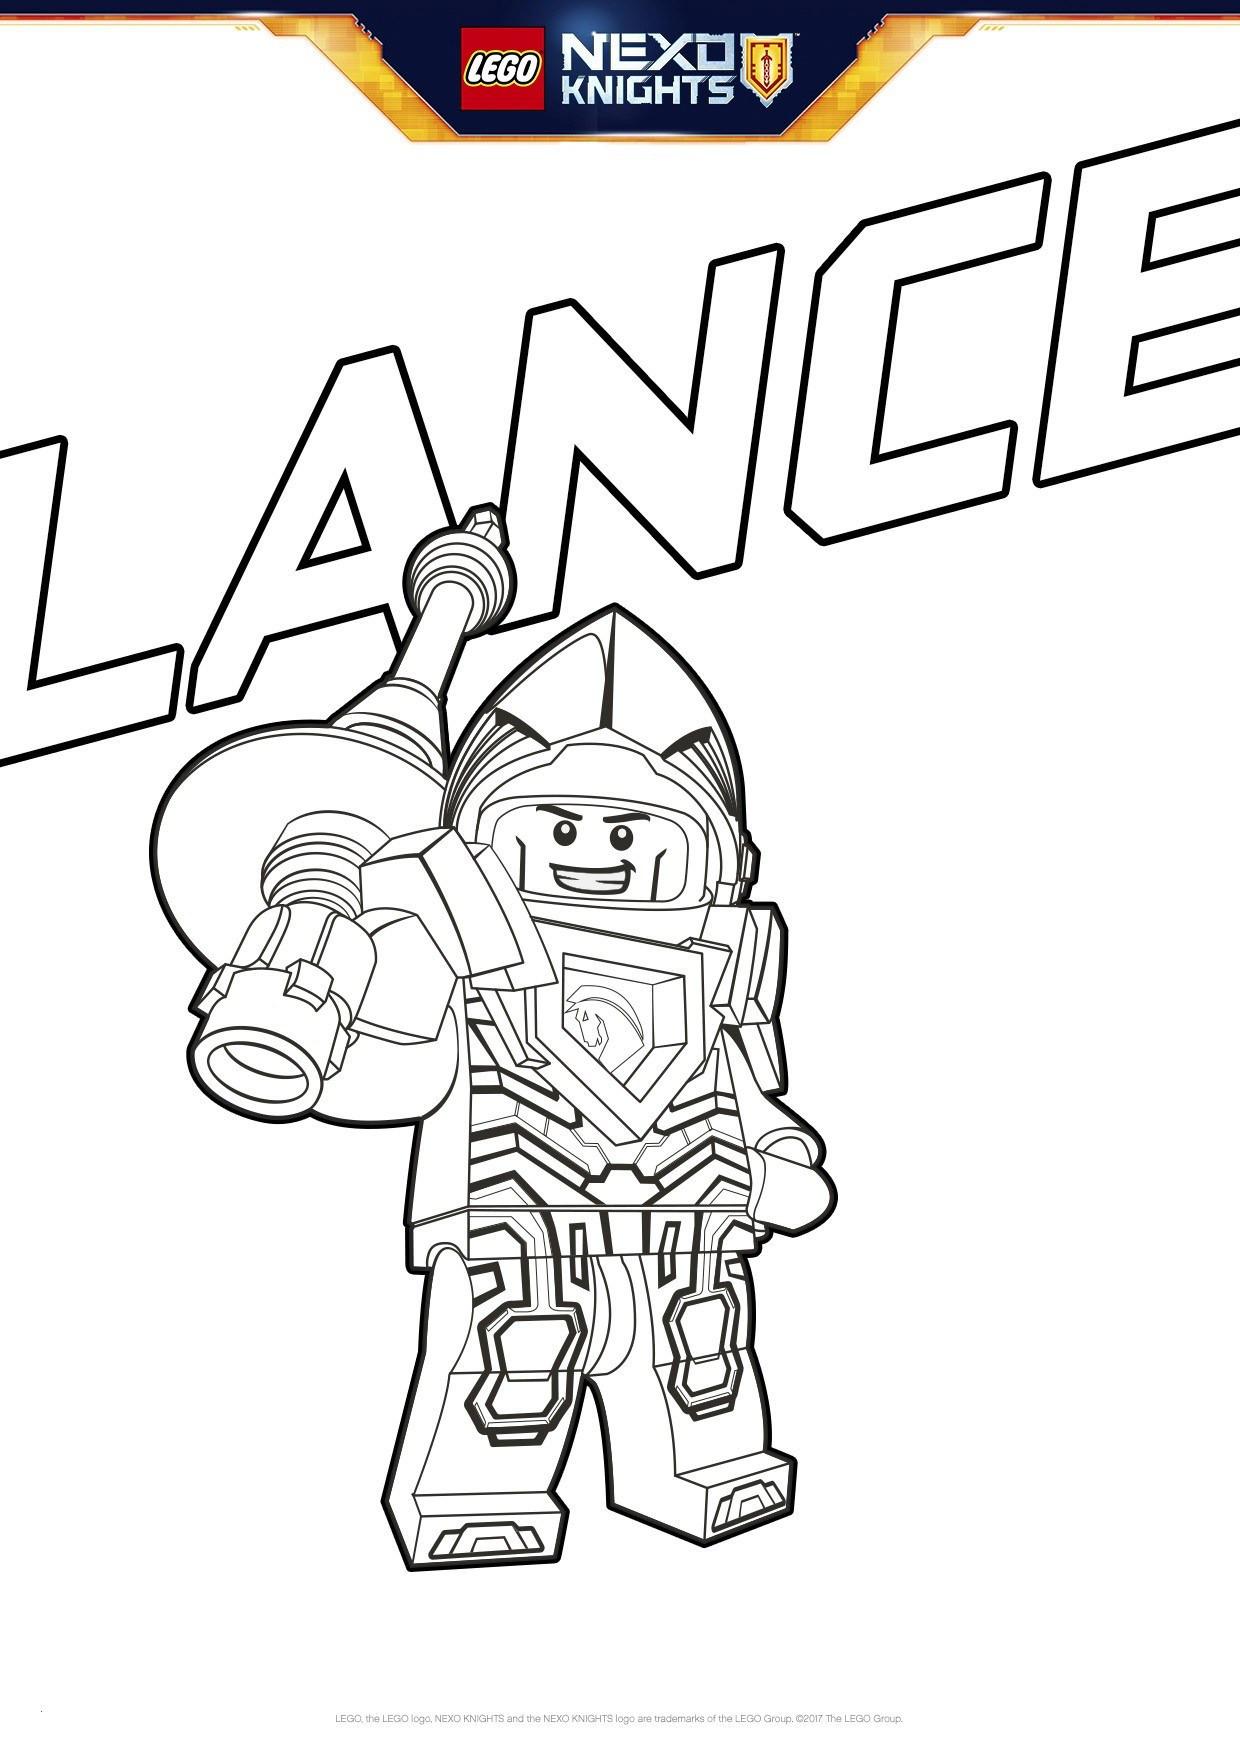 Lego Ninjago Bilder Zum Ausdrucken Inspirierend 37 Lego Ninjago Malvorlagen Scoredatscore Genial Ausmalbilder Lego Sammlung